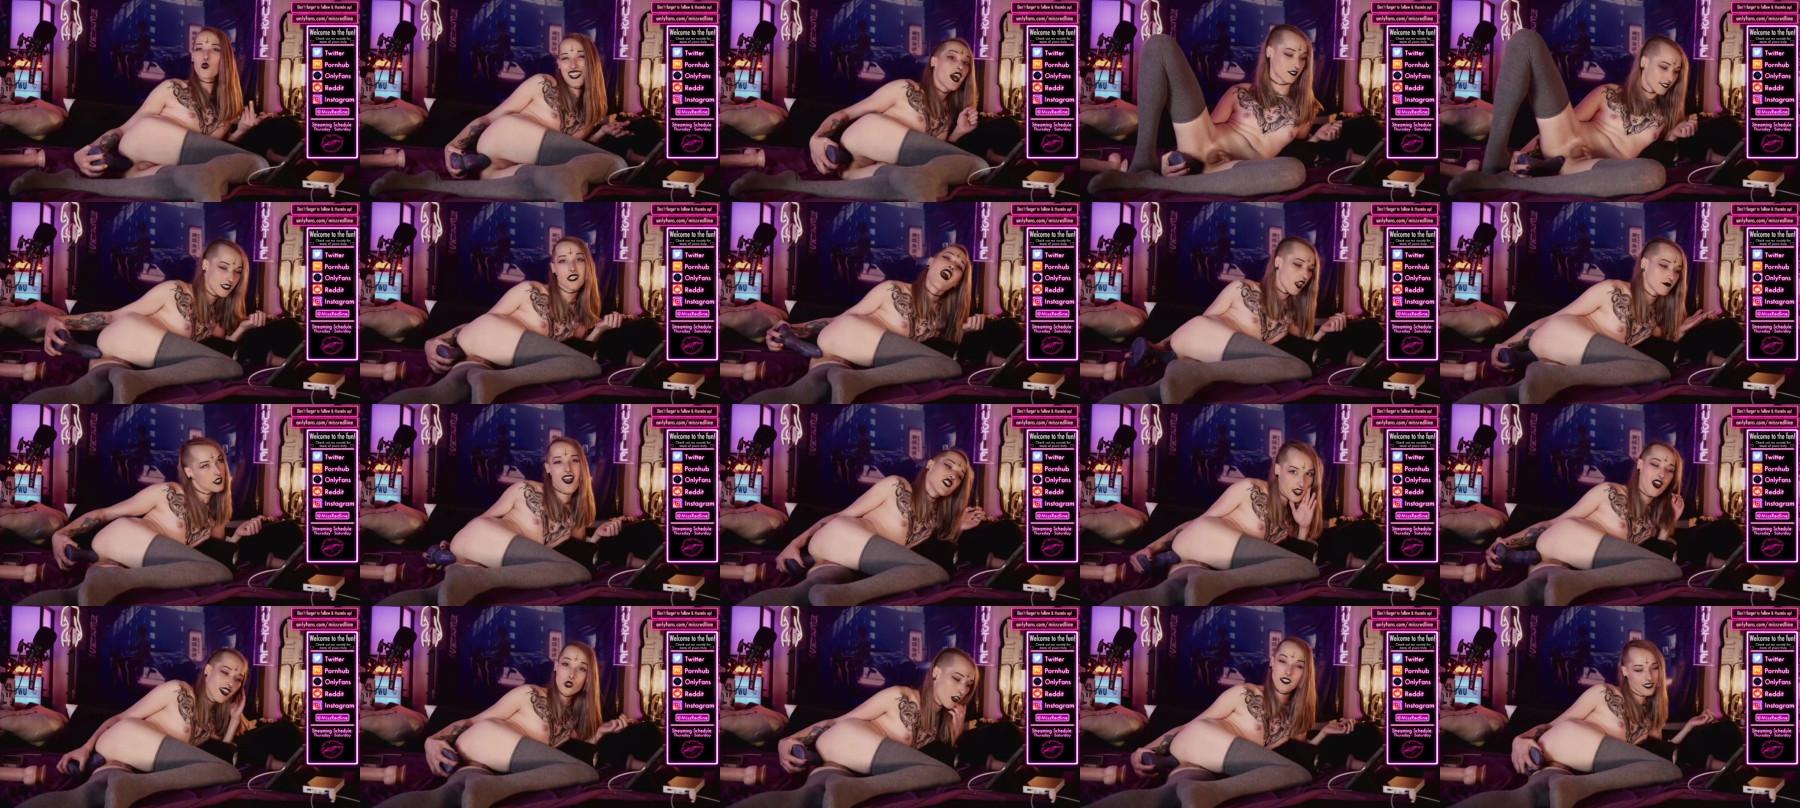 Missredline Chaturbate 15-04-2021 Trans Topless